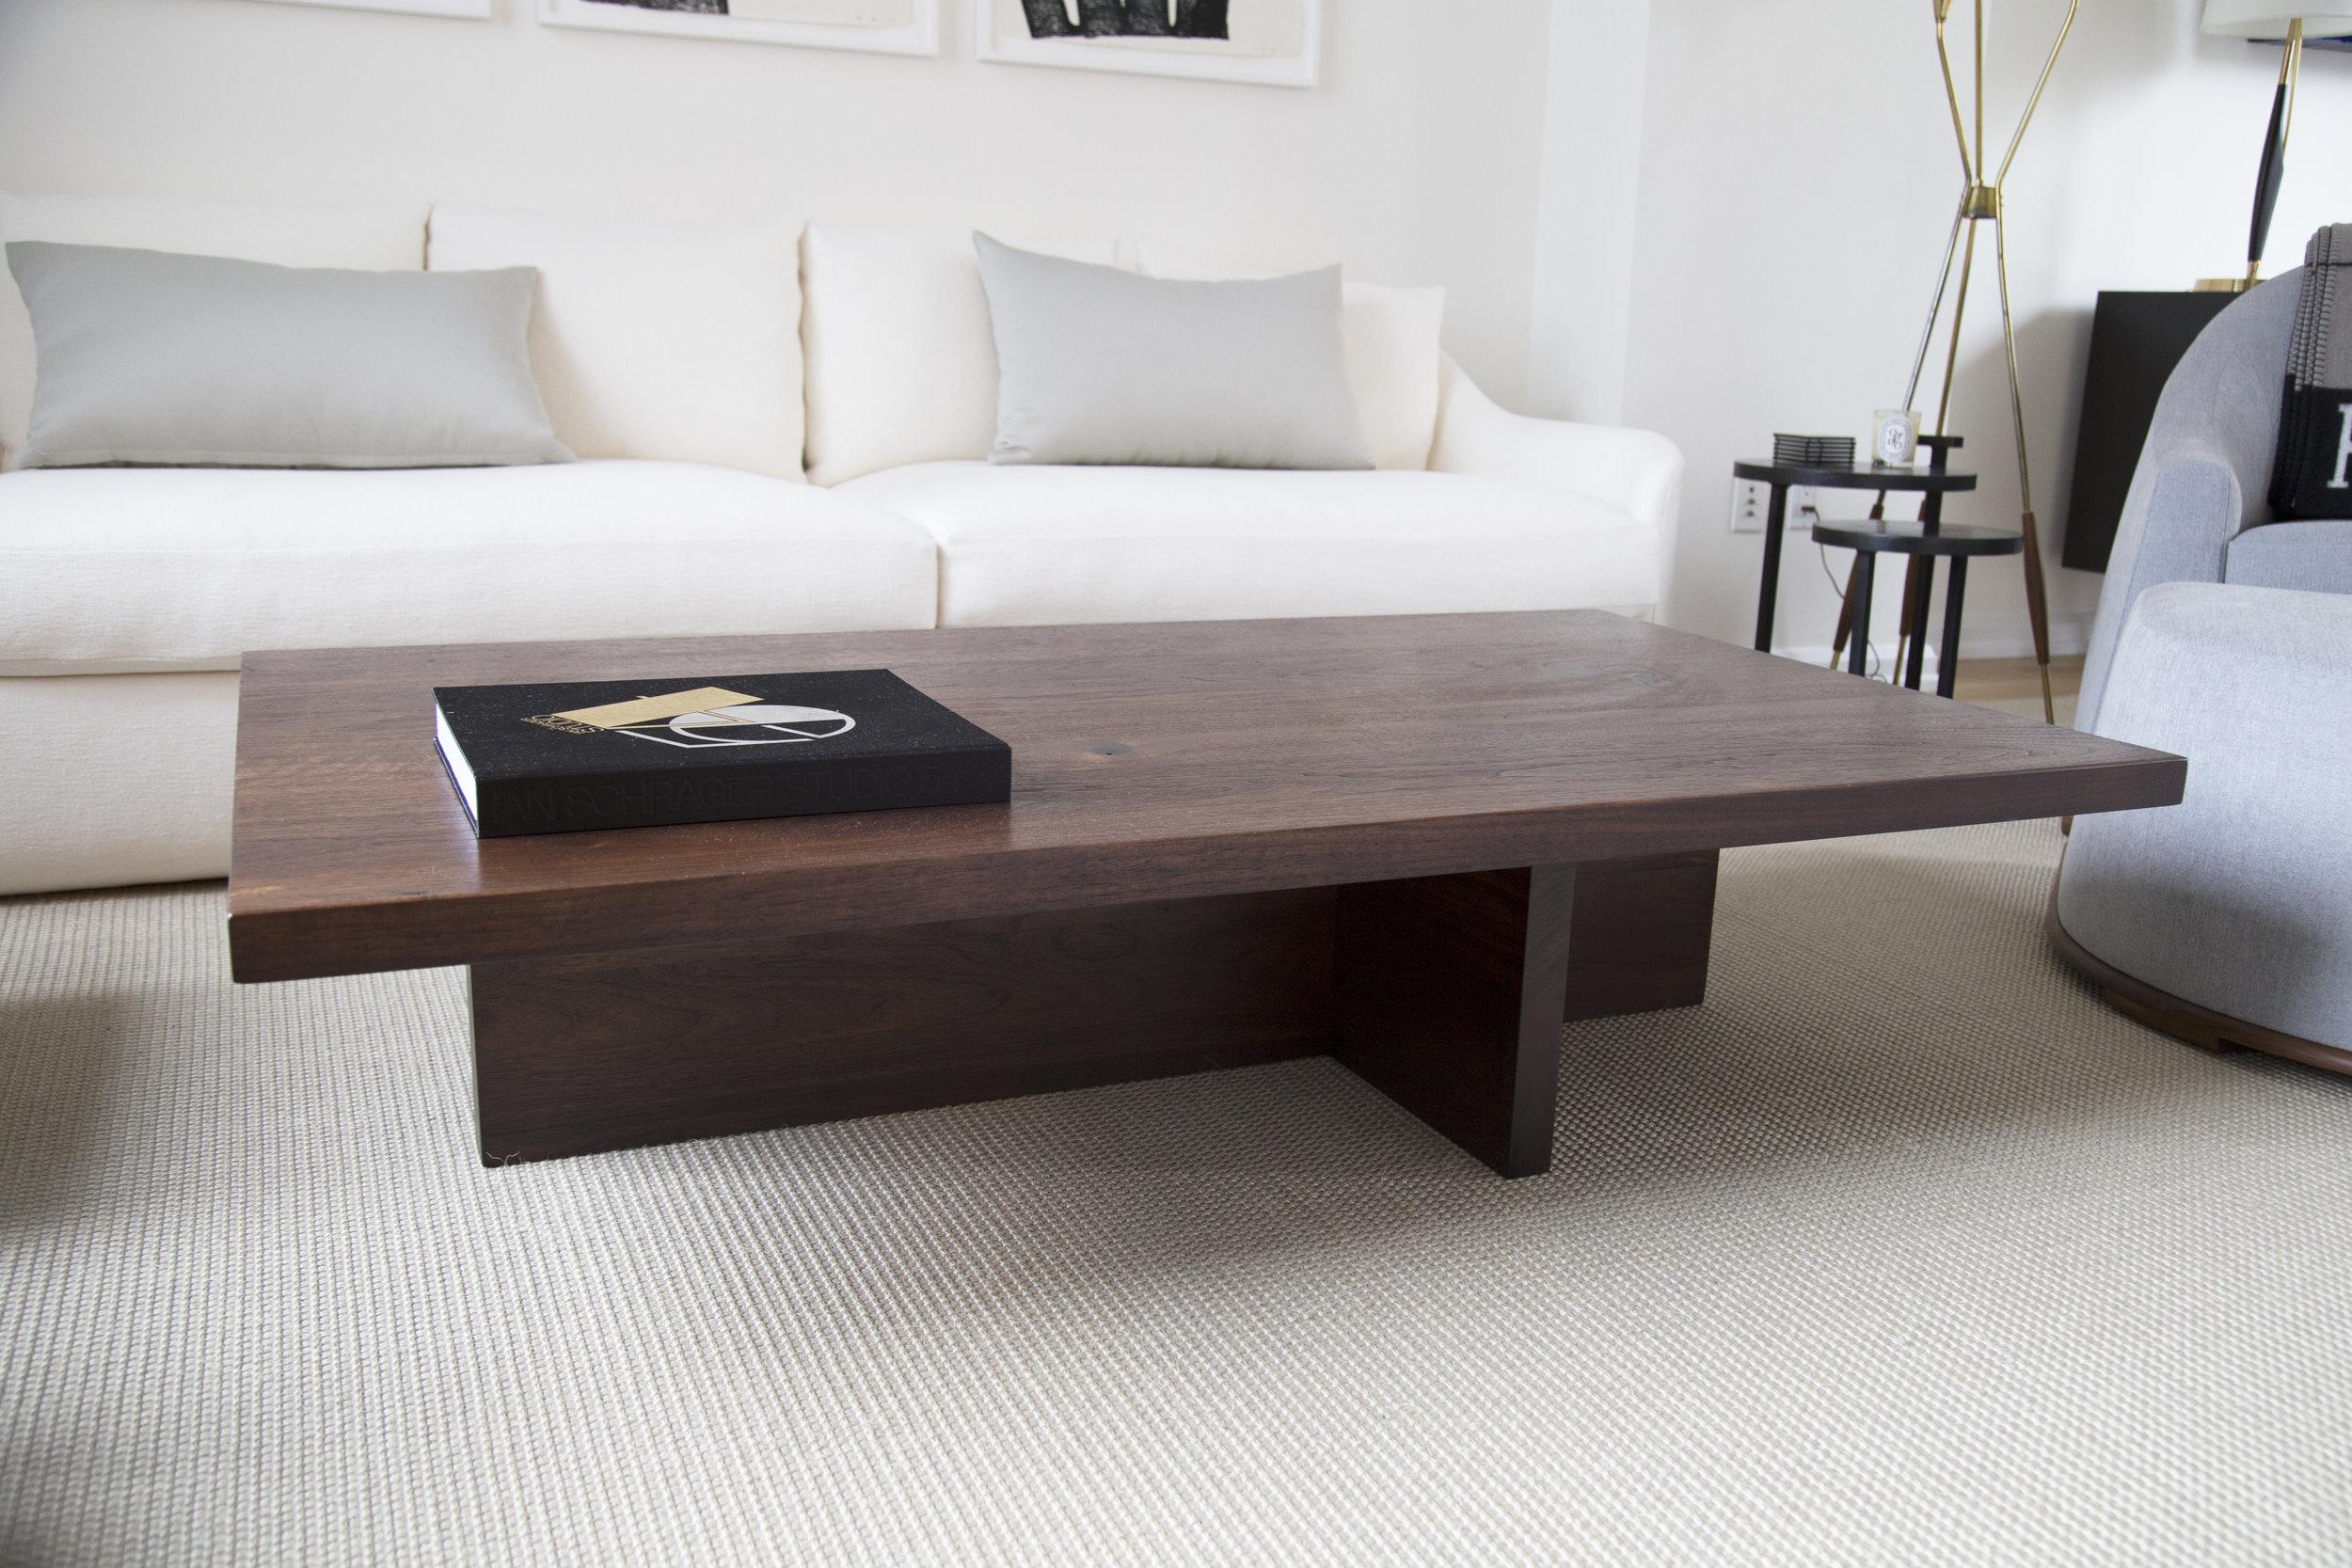 Mckinley_walnut_coffee_table_8.jpg